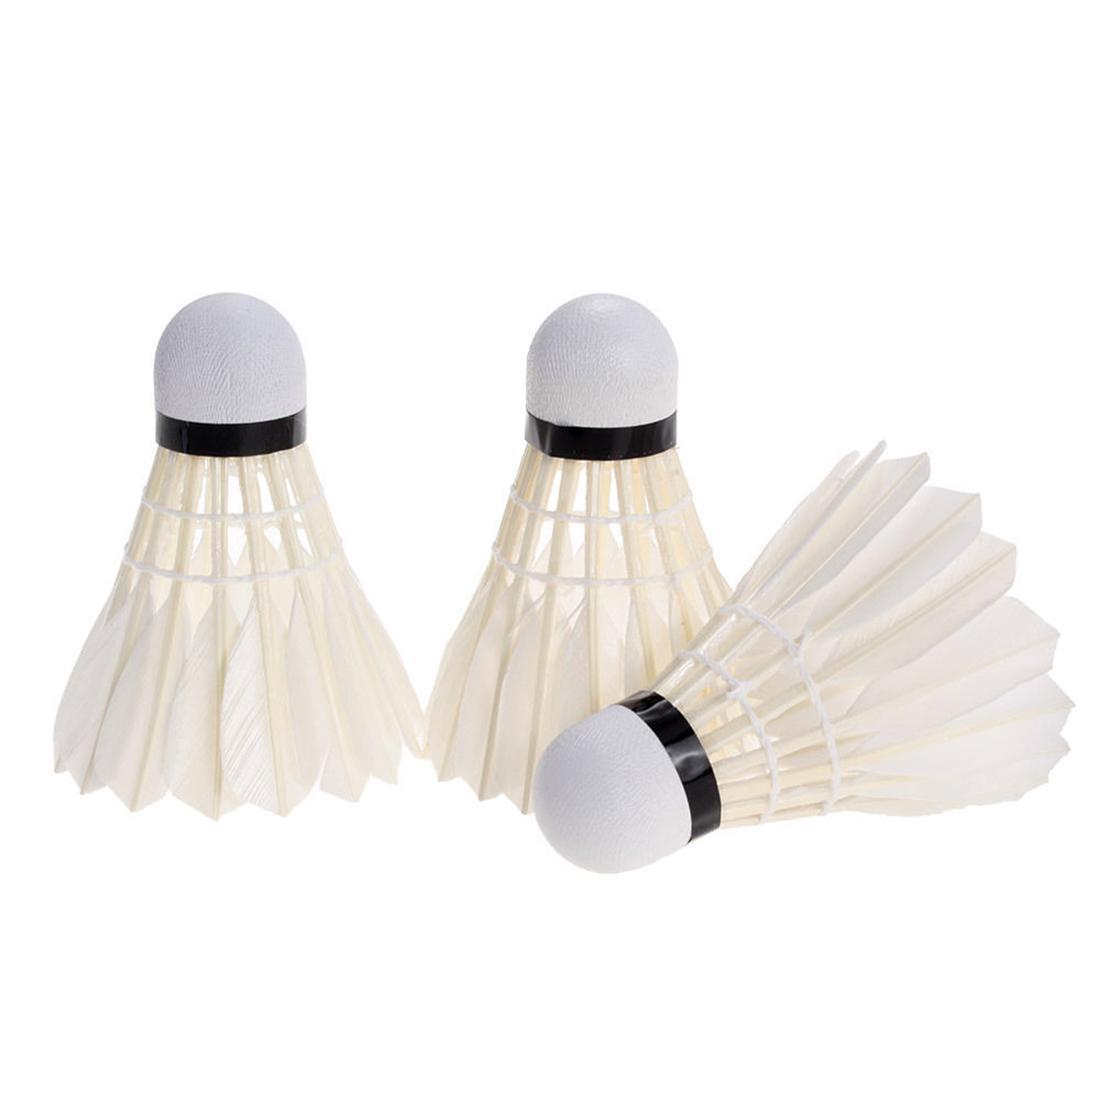 6 farbige Federbälle Badminton Federball Badmintonbälle Ball Bälle TOP Preis Badminton